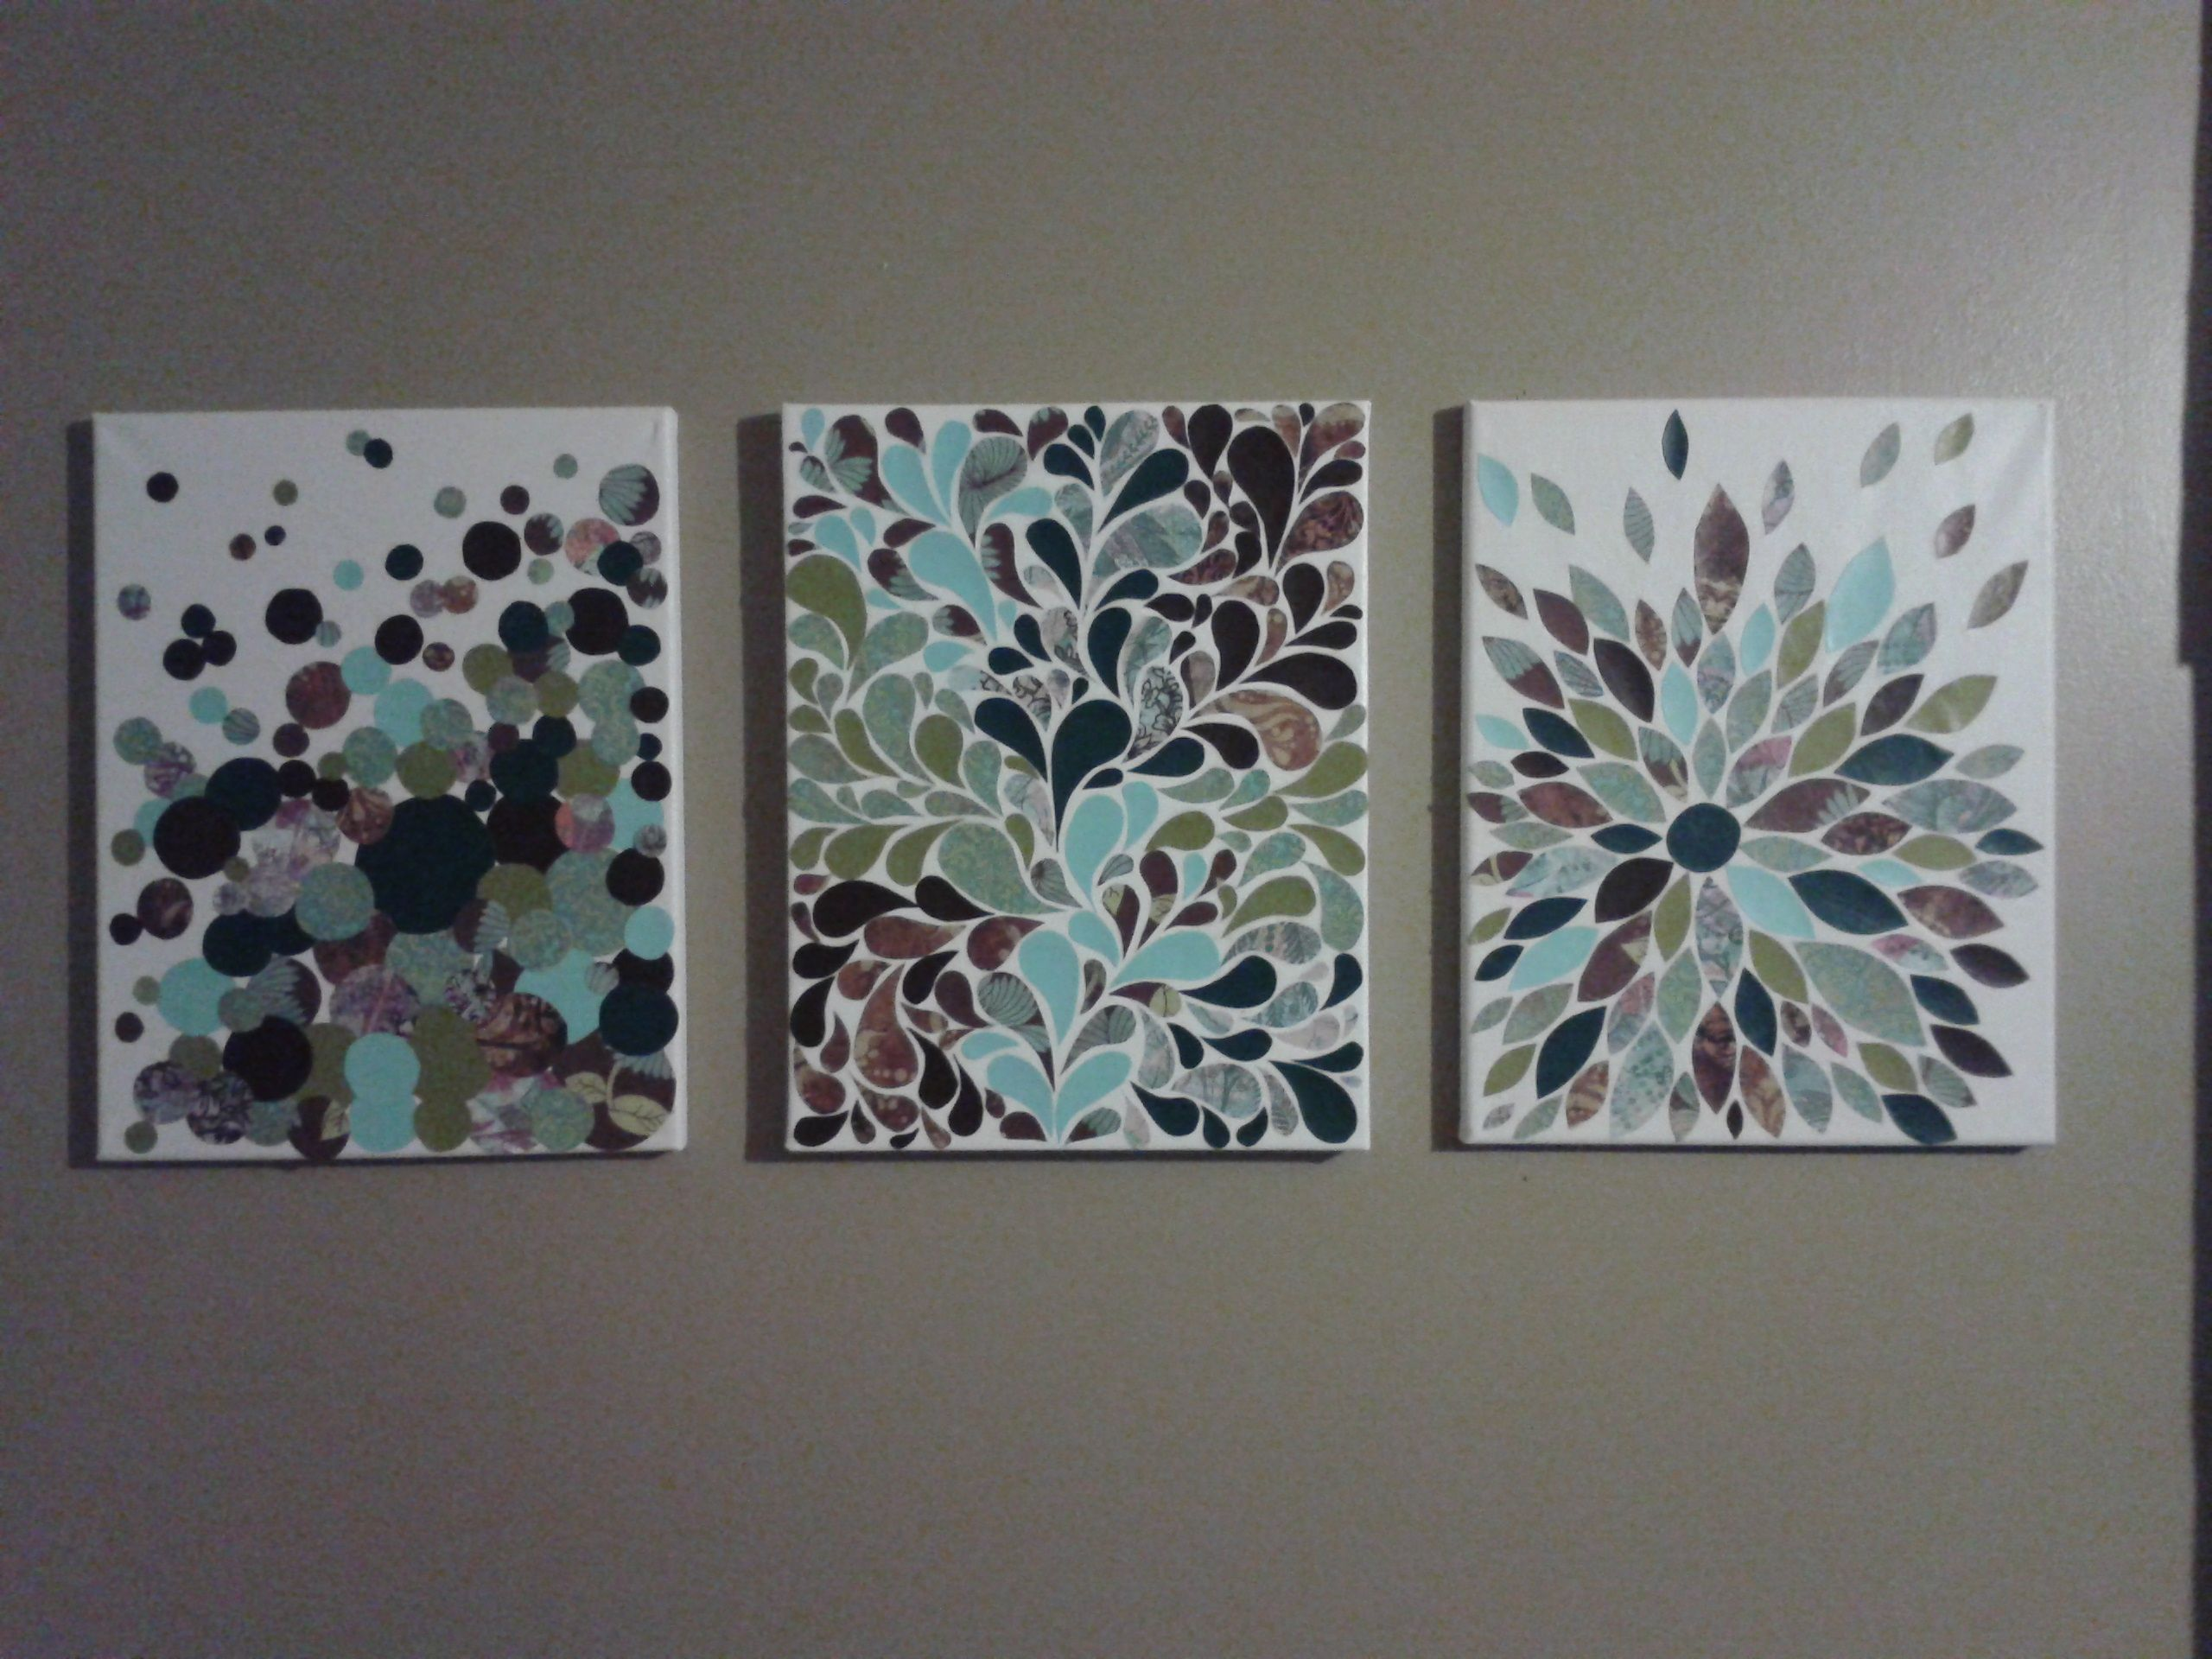 Scrapbook paper art ideas - My Scrapbook Paper And Canvas Art